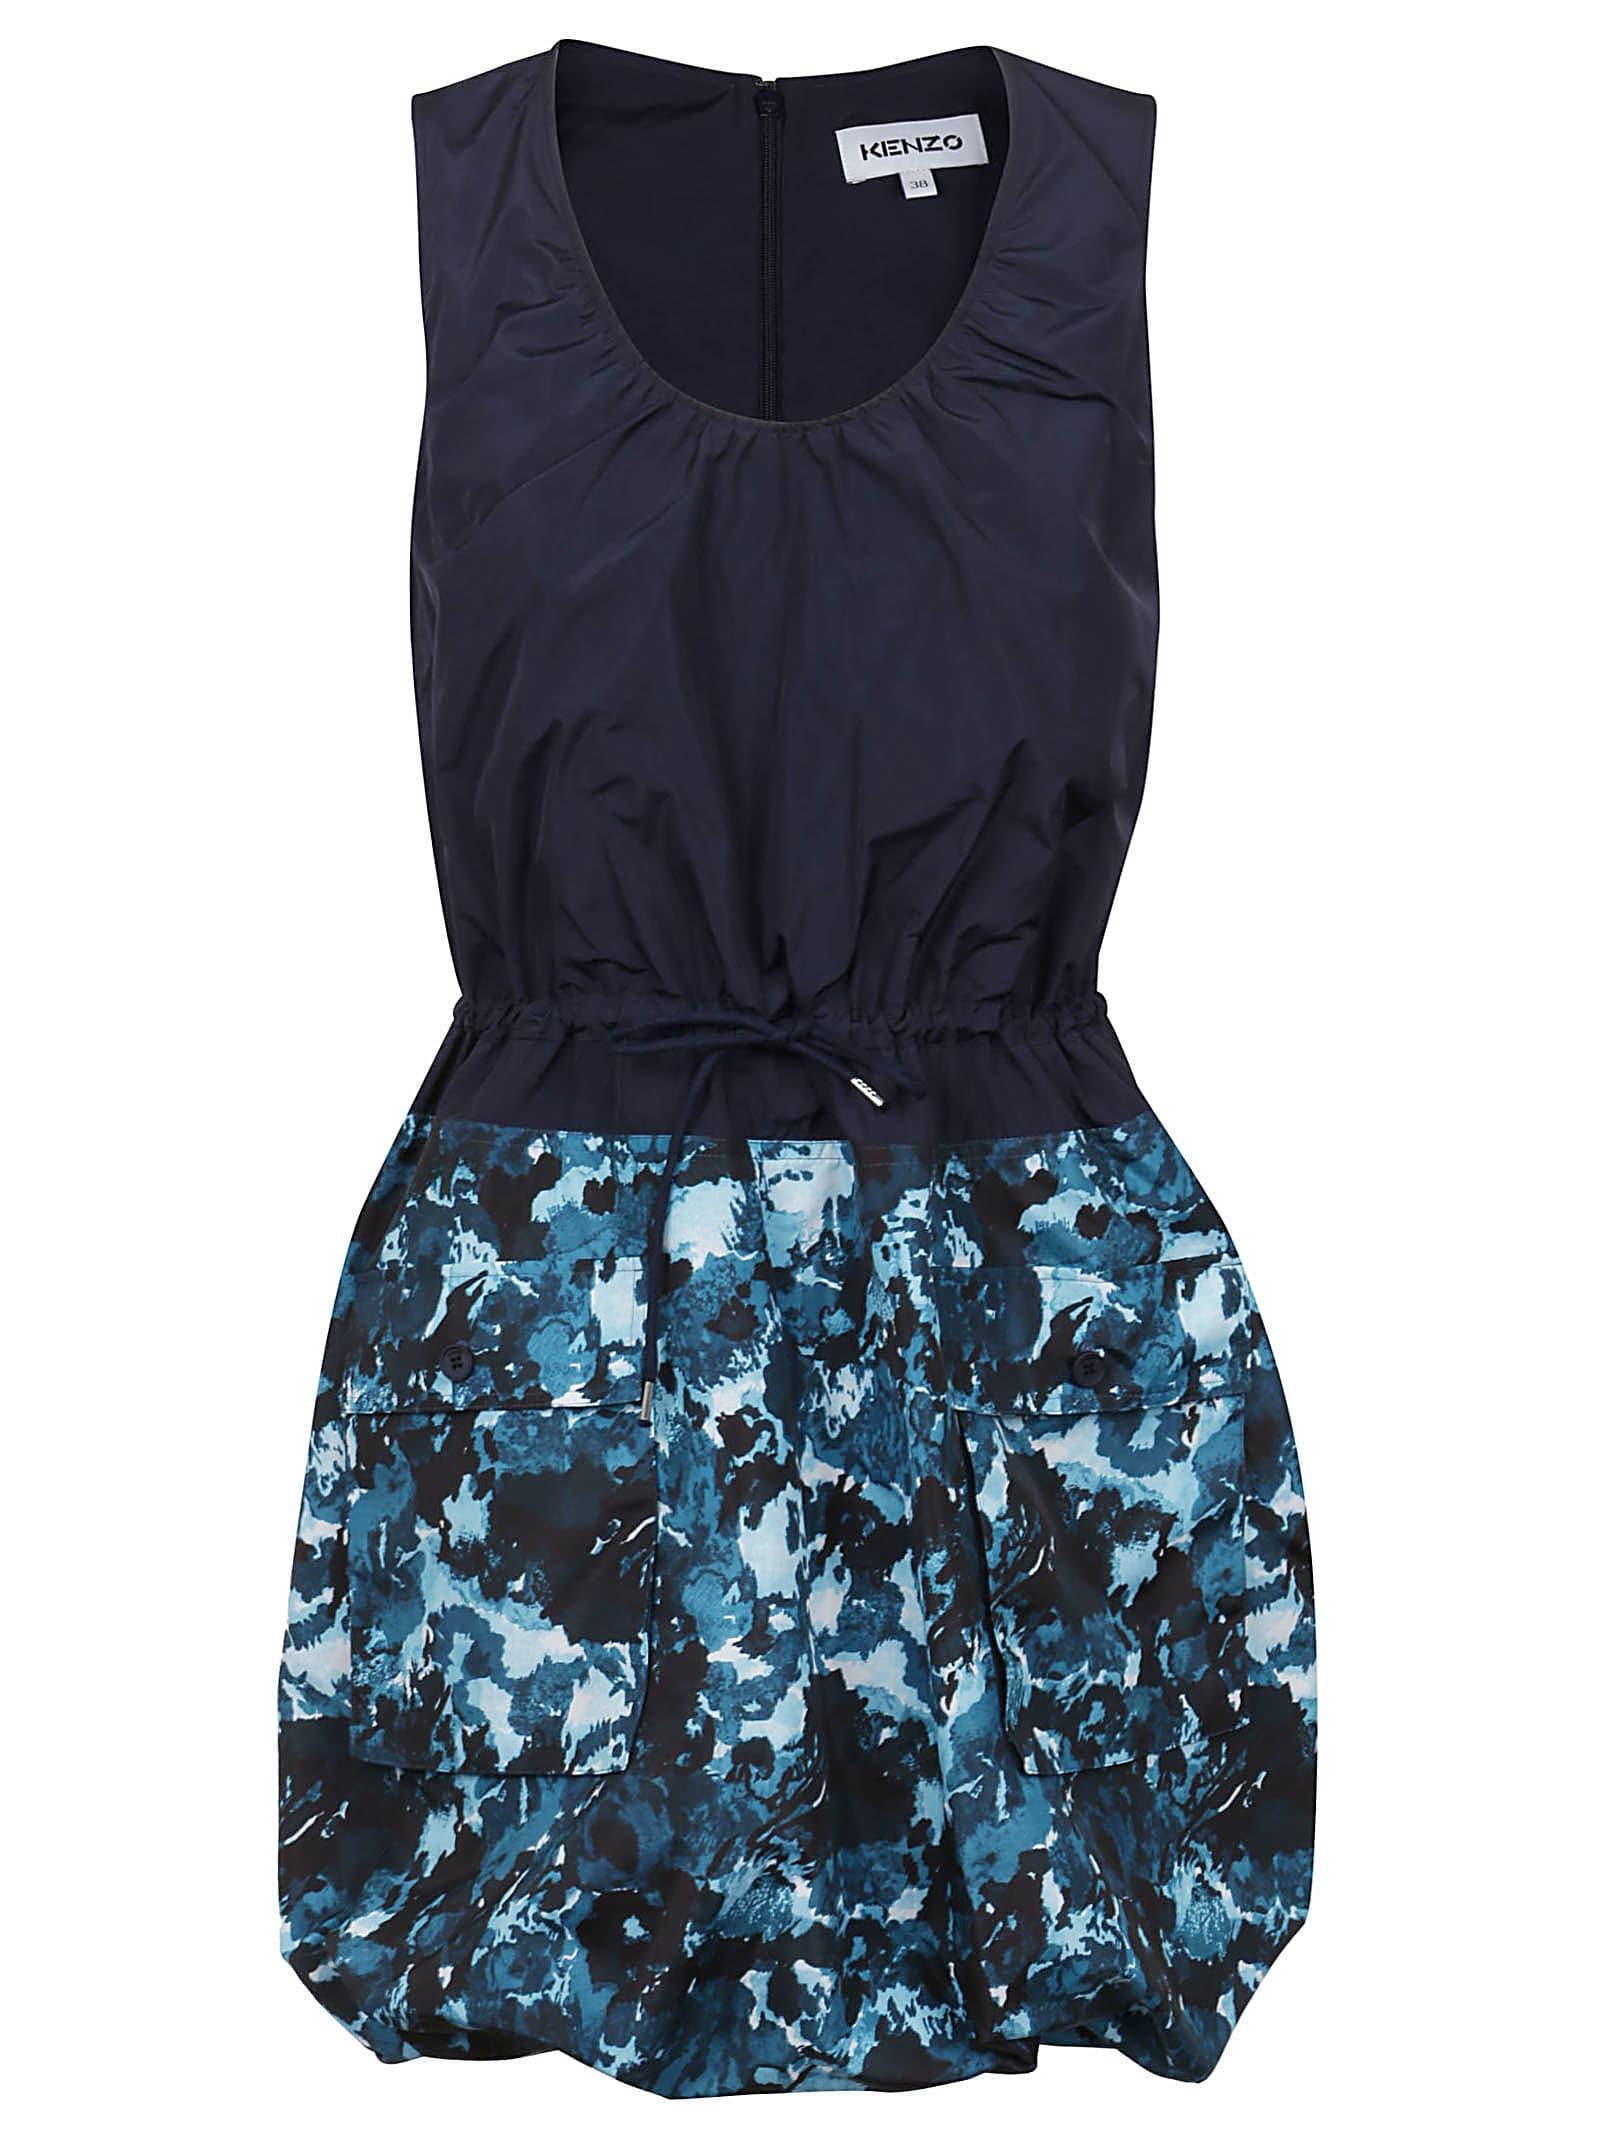 Kenzo Sleeveless Dress Mixed Fabric